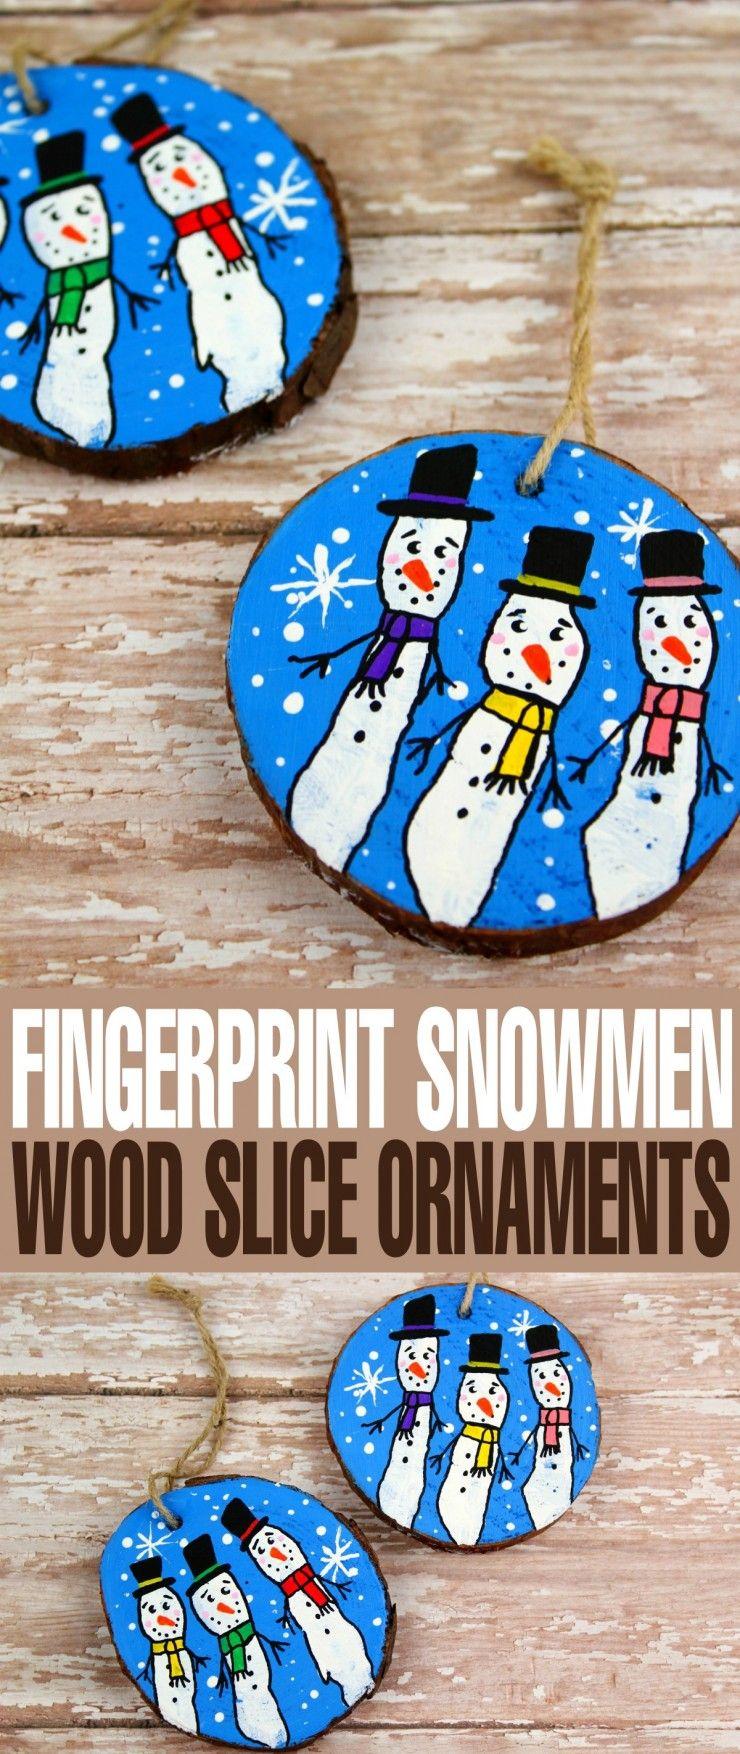 Wood Slice Fingerprint Snowmen Ornaments Christmas Party Crafts Christmas Ornaments Homemade Wood Christmas Ornaments